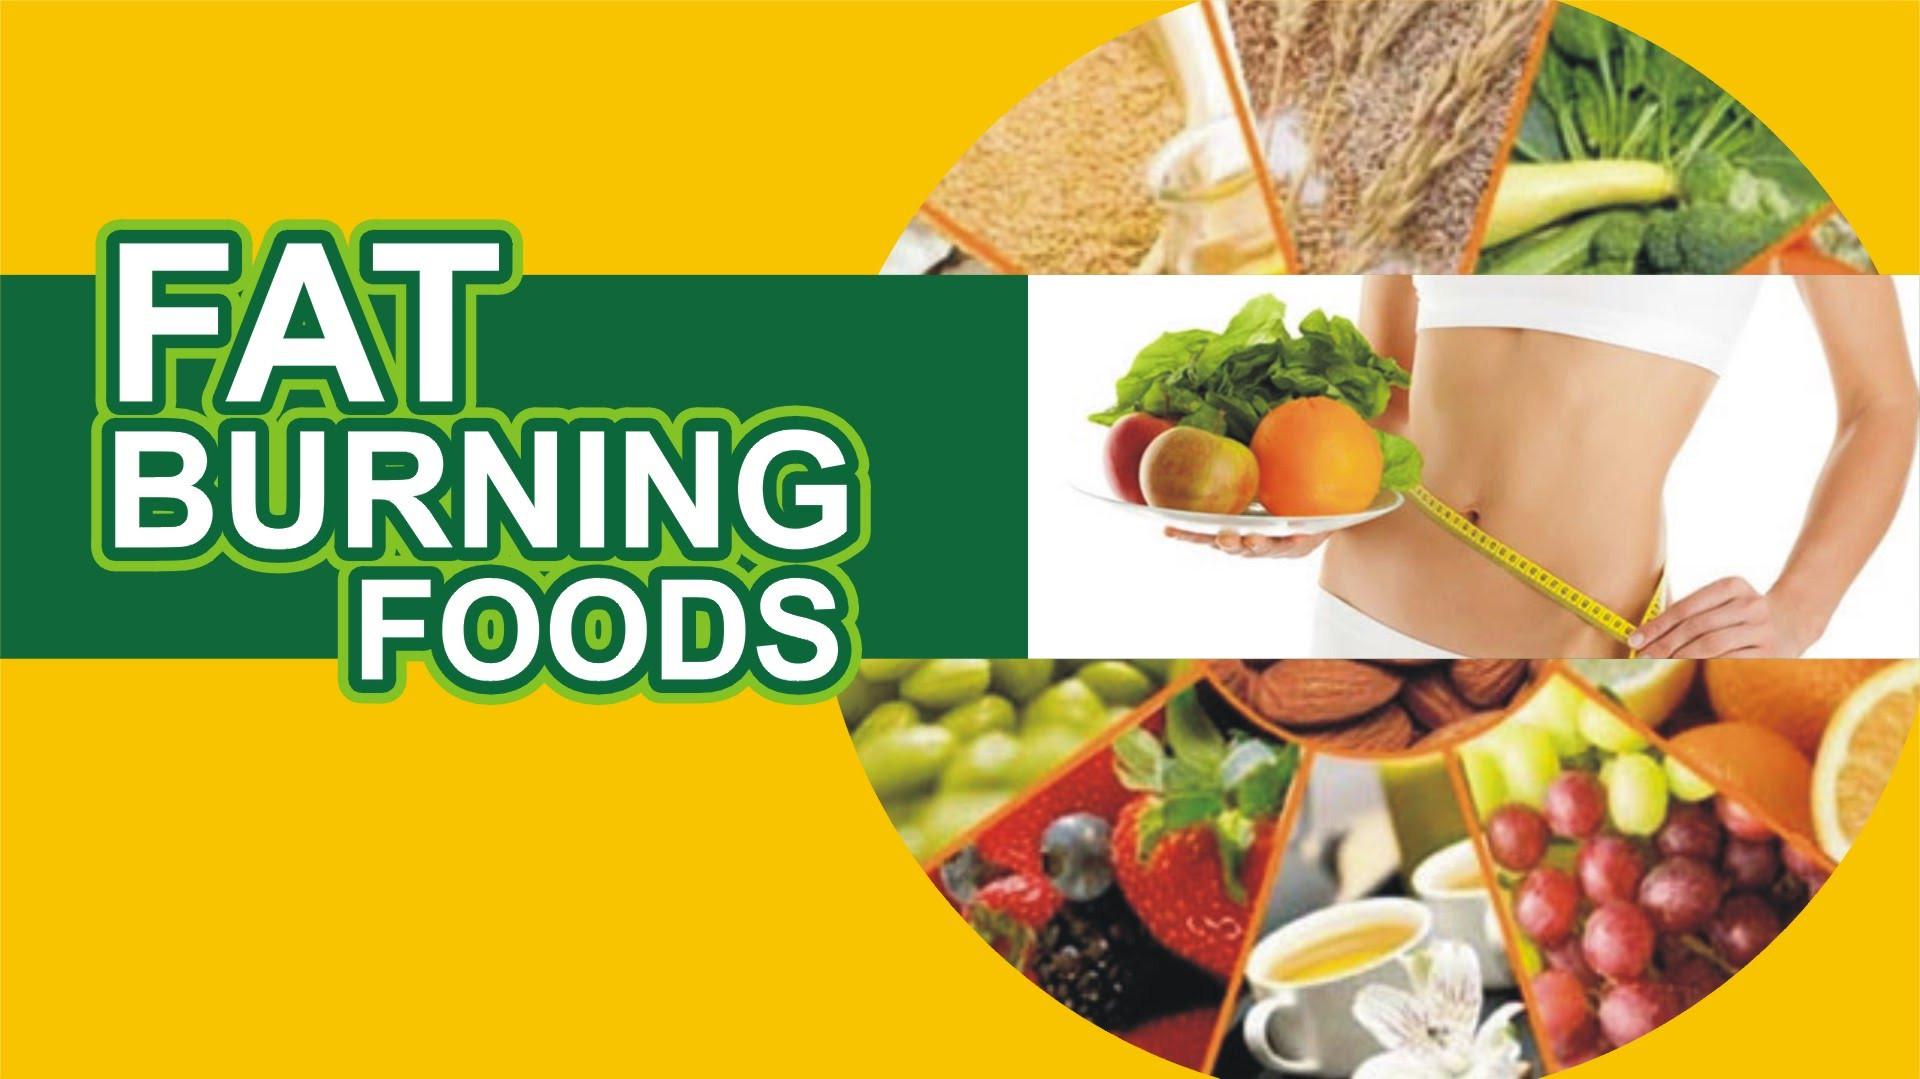 Best Fat Burning Foods  Five Best Fat Burning Foods to Eat